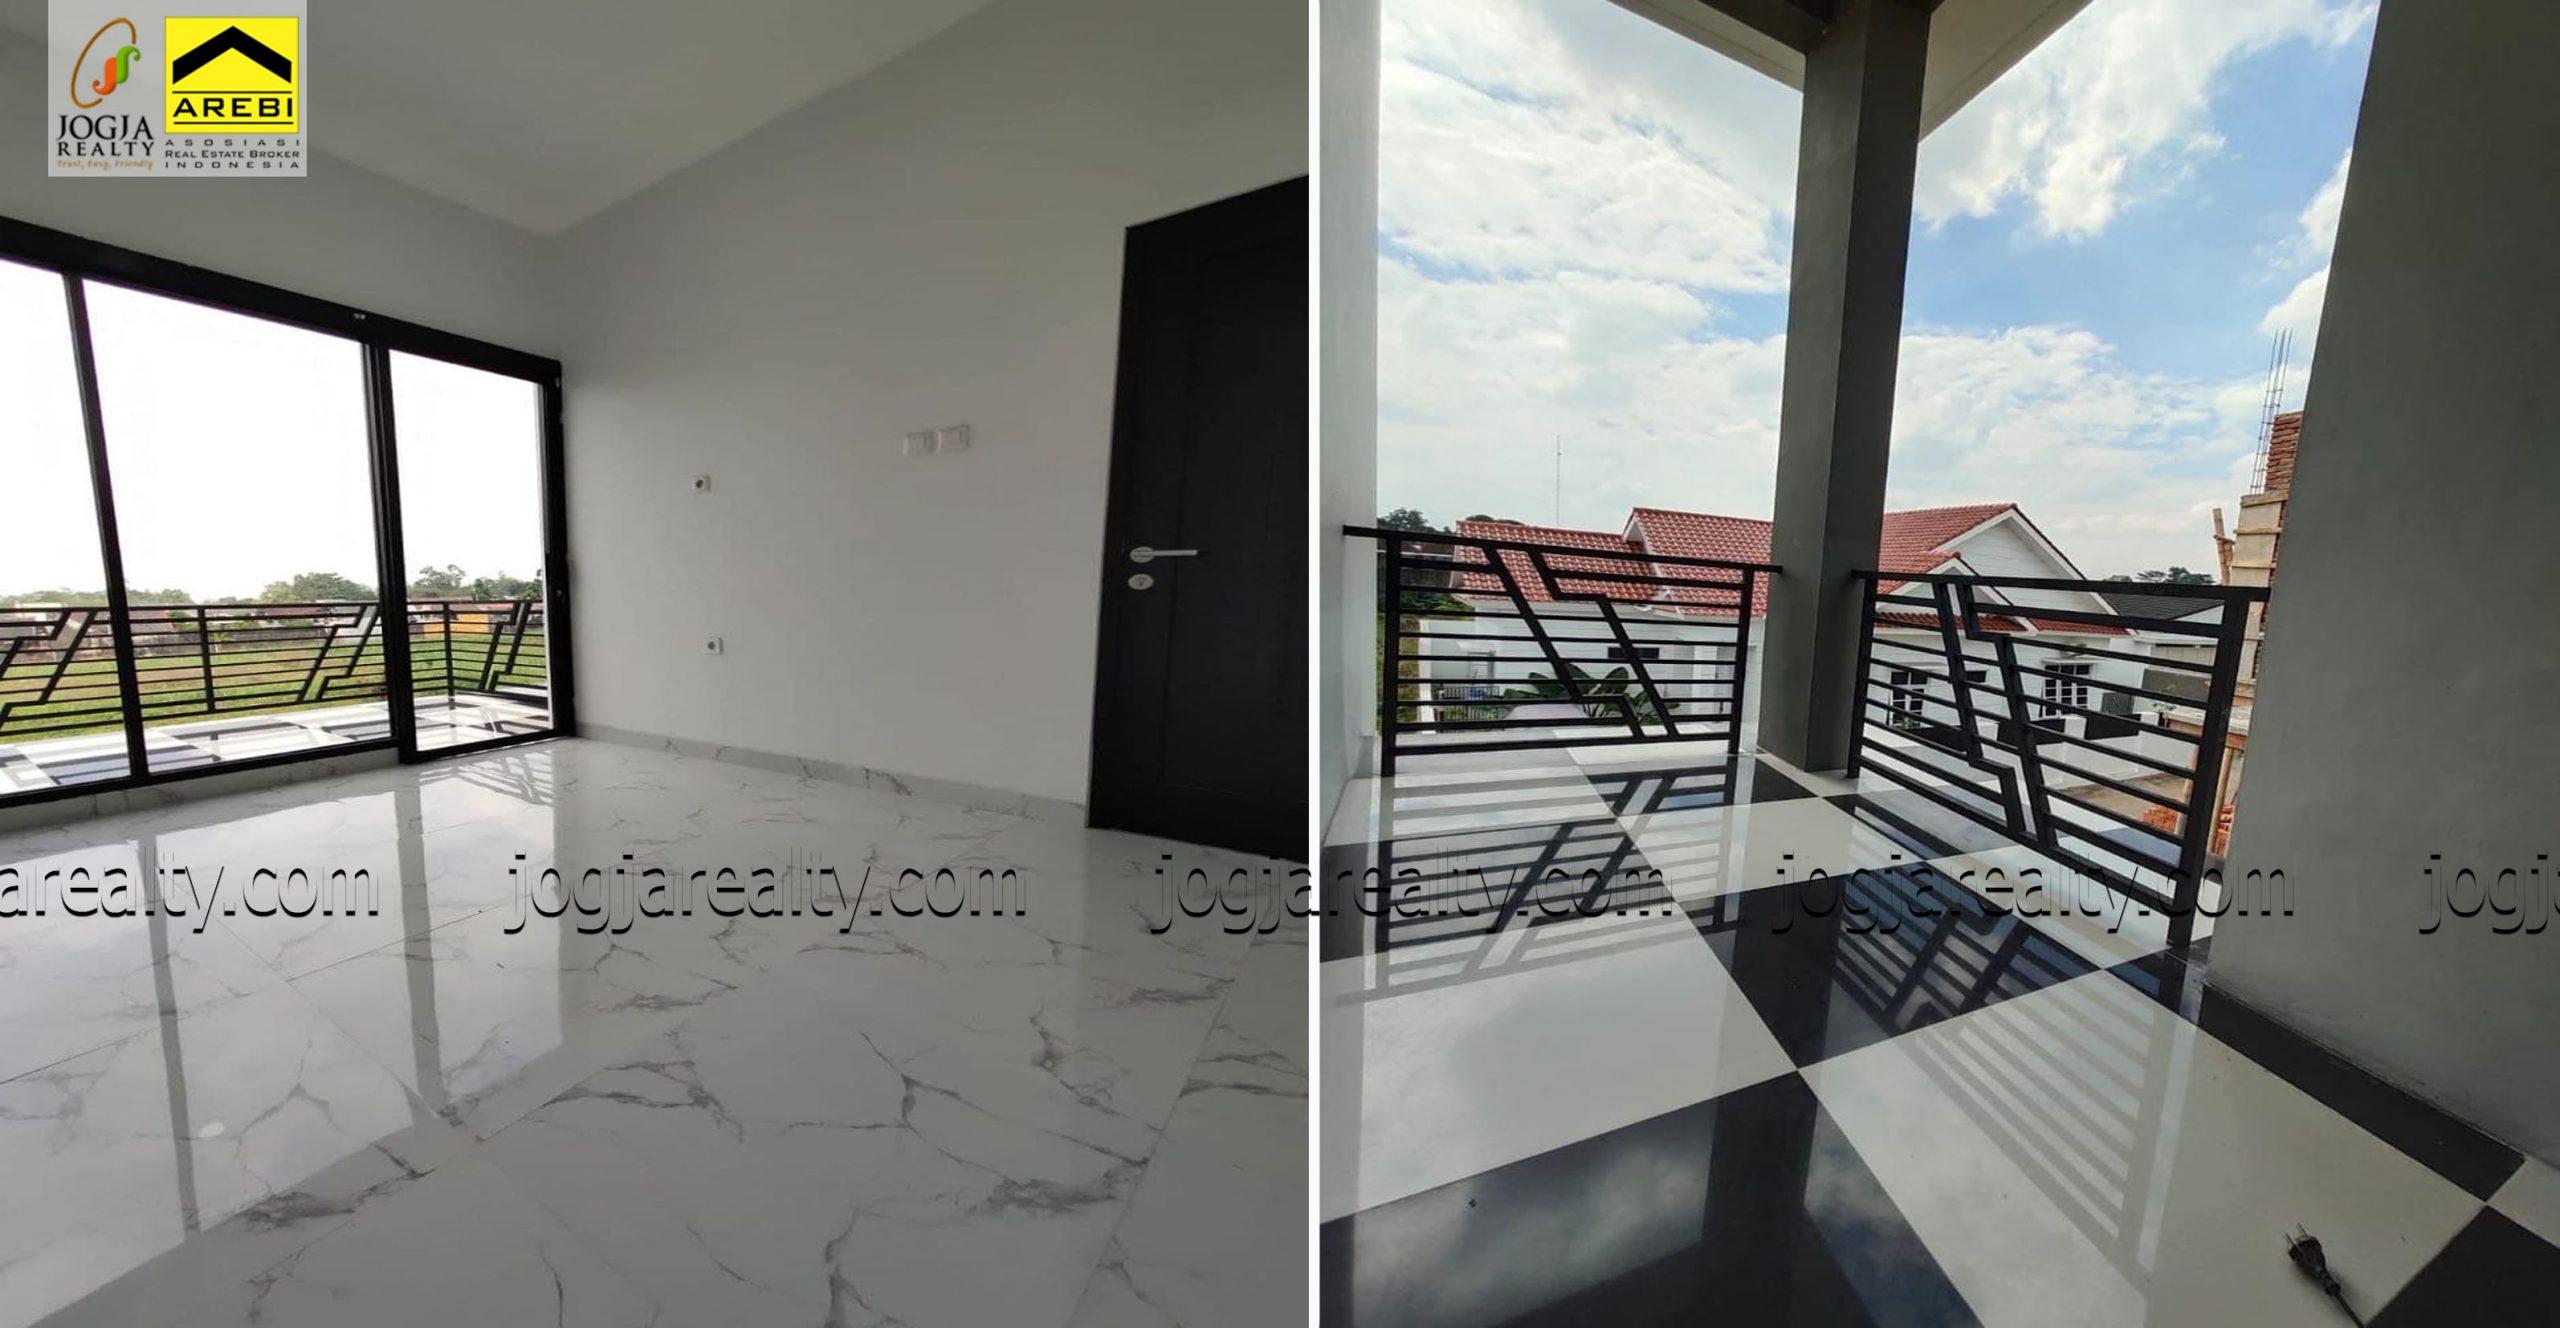 Rumah minimalis model scandinavian dijual Jogja